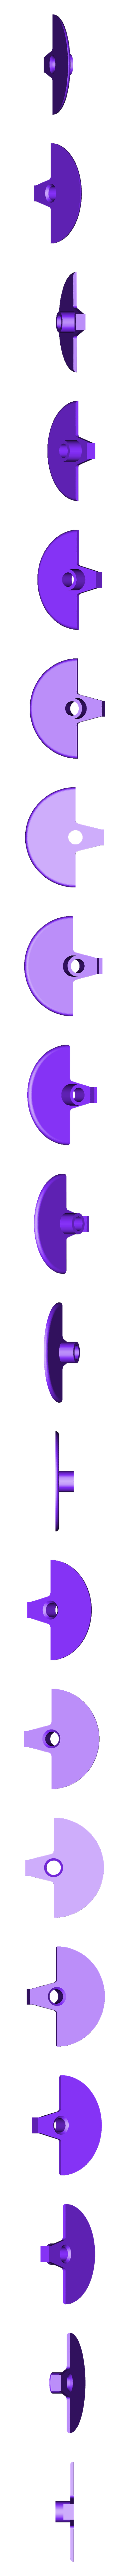 wmy-wheel-pot-03.stl Download free STL file MX MIDI Guitar • 3D print model, Adafruit